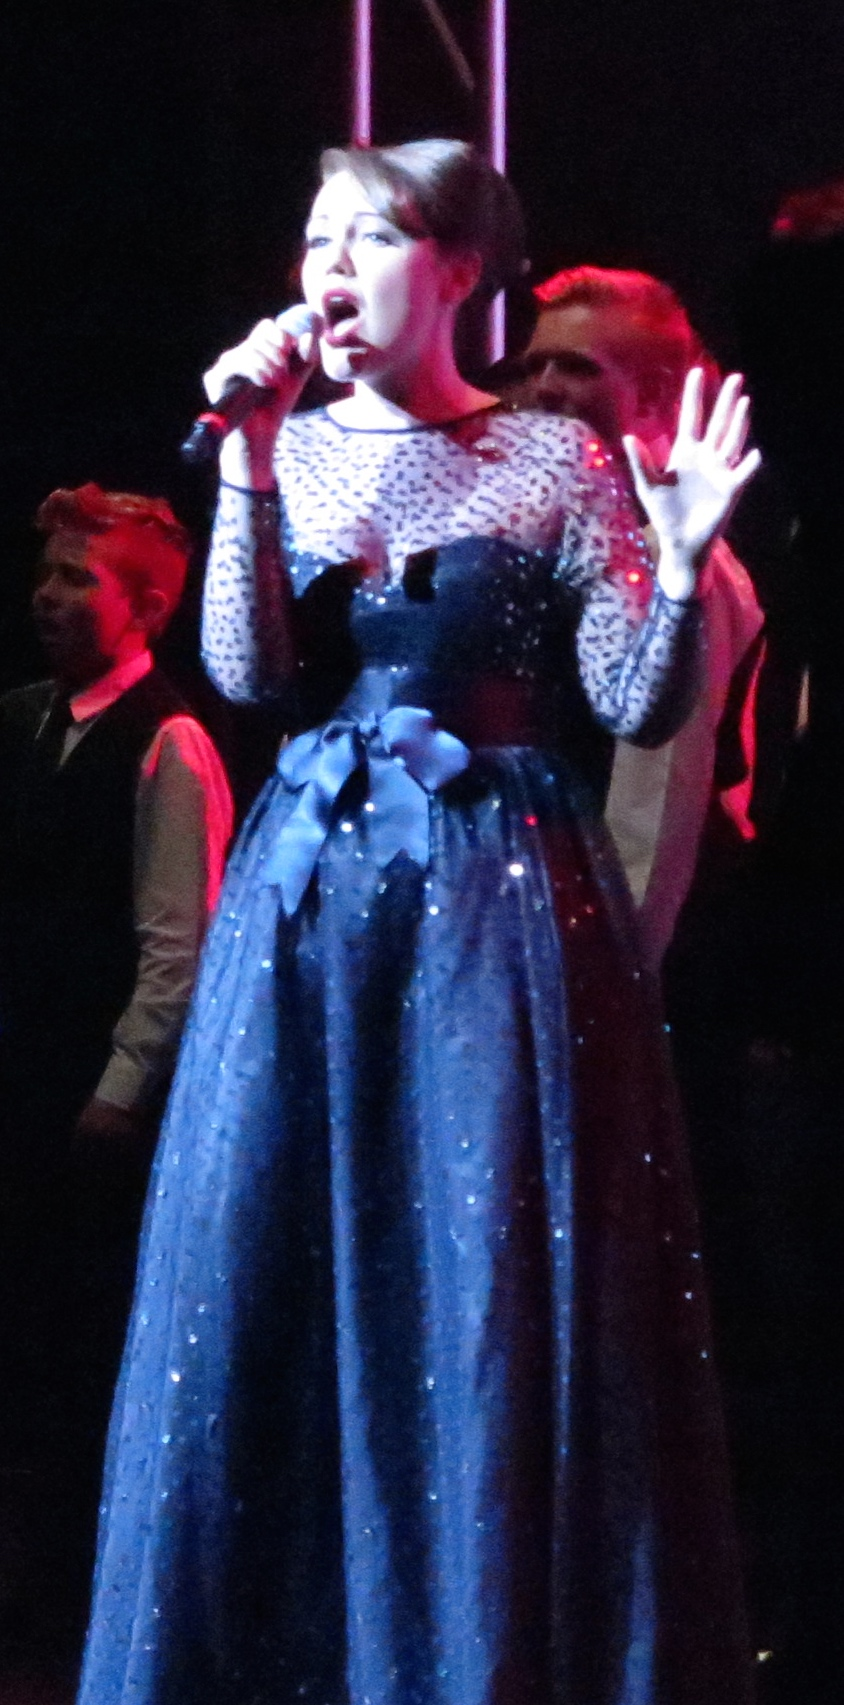 Emma sings Katy Perry's Firework